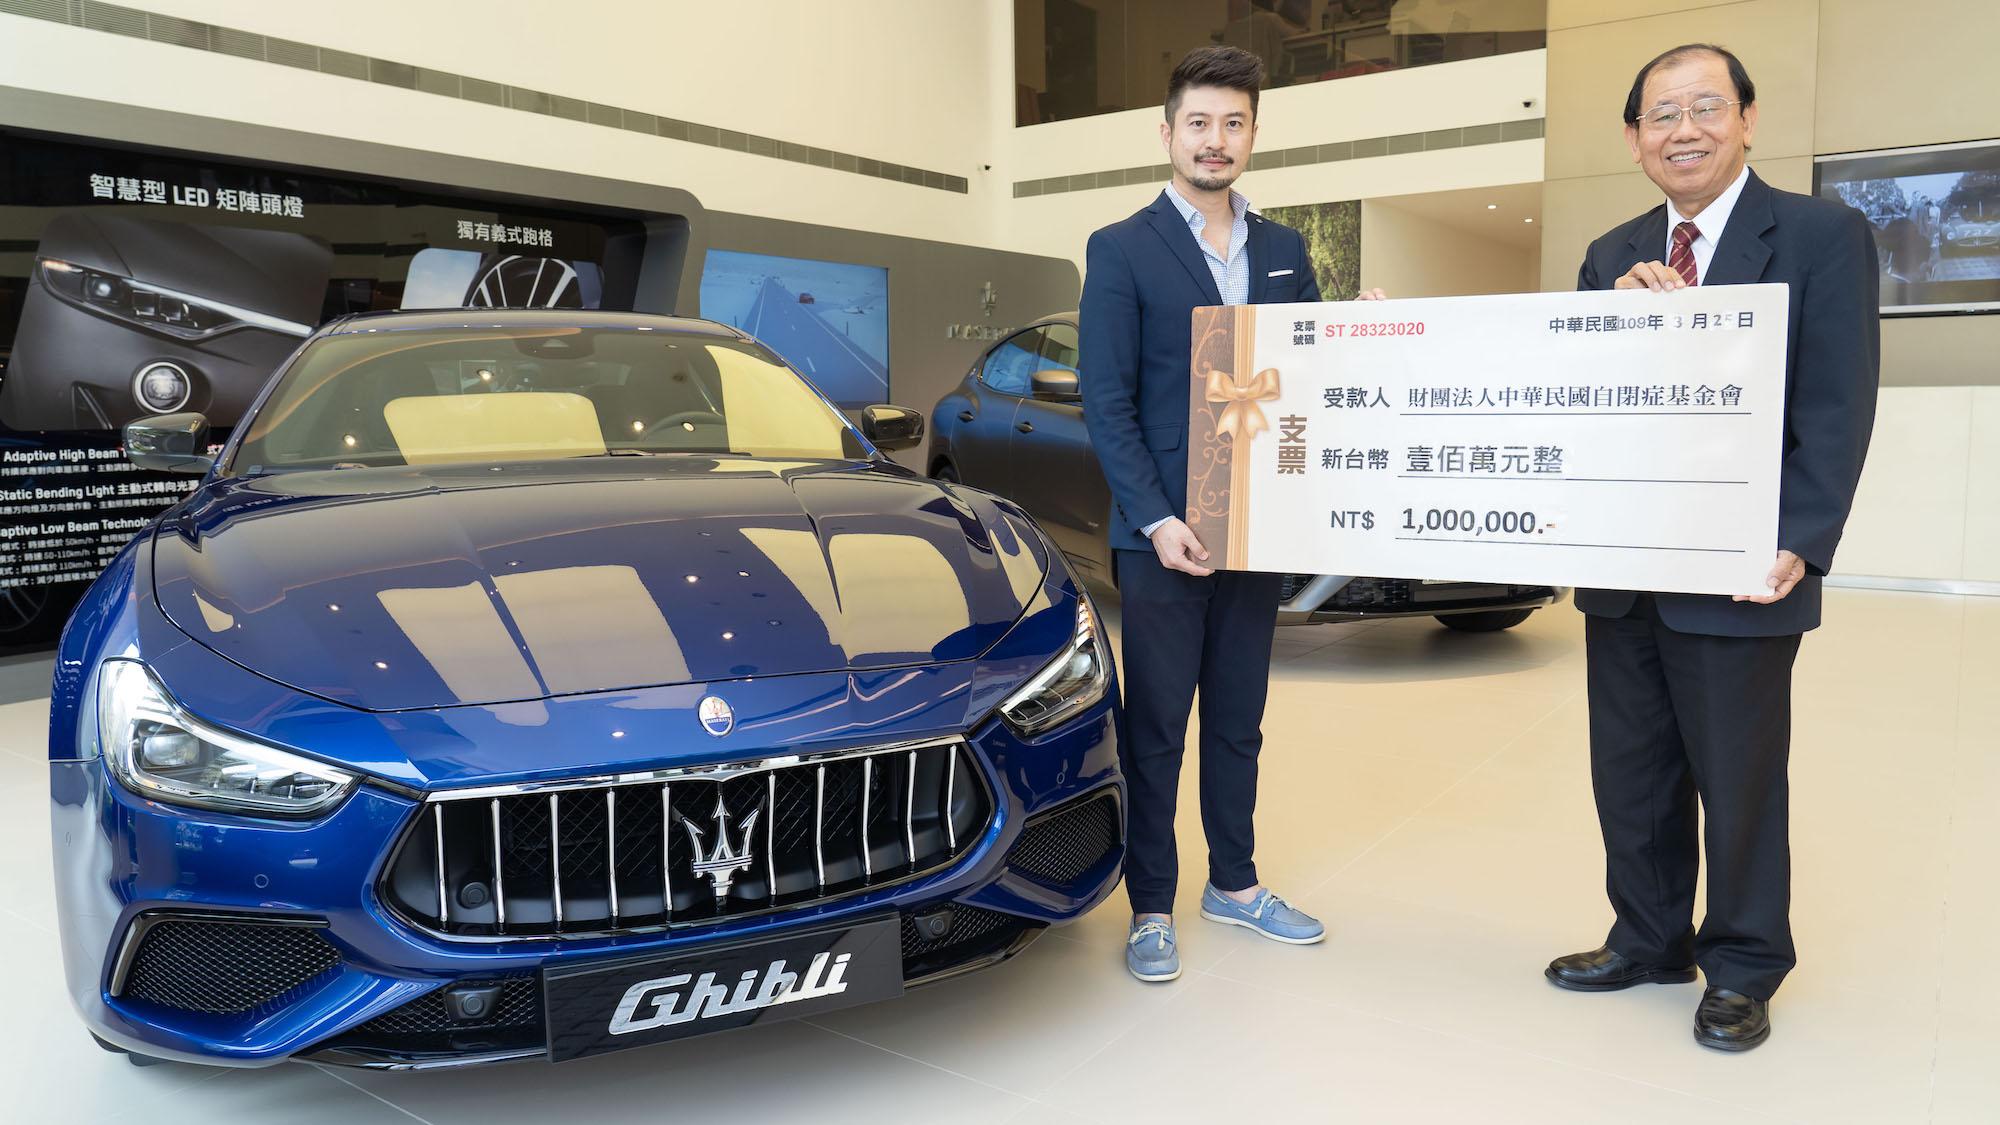 Maserati Taiwan 響應世界關懷自閉症日,連續 7 年支持中華民國自閉症基金會